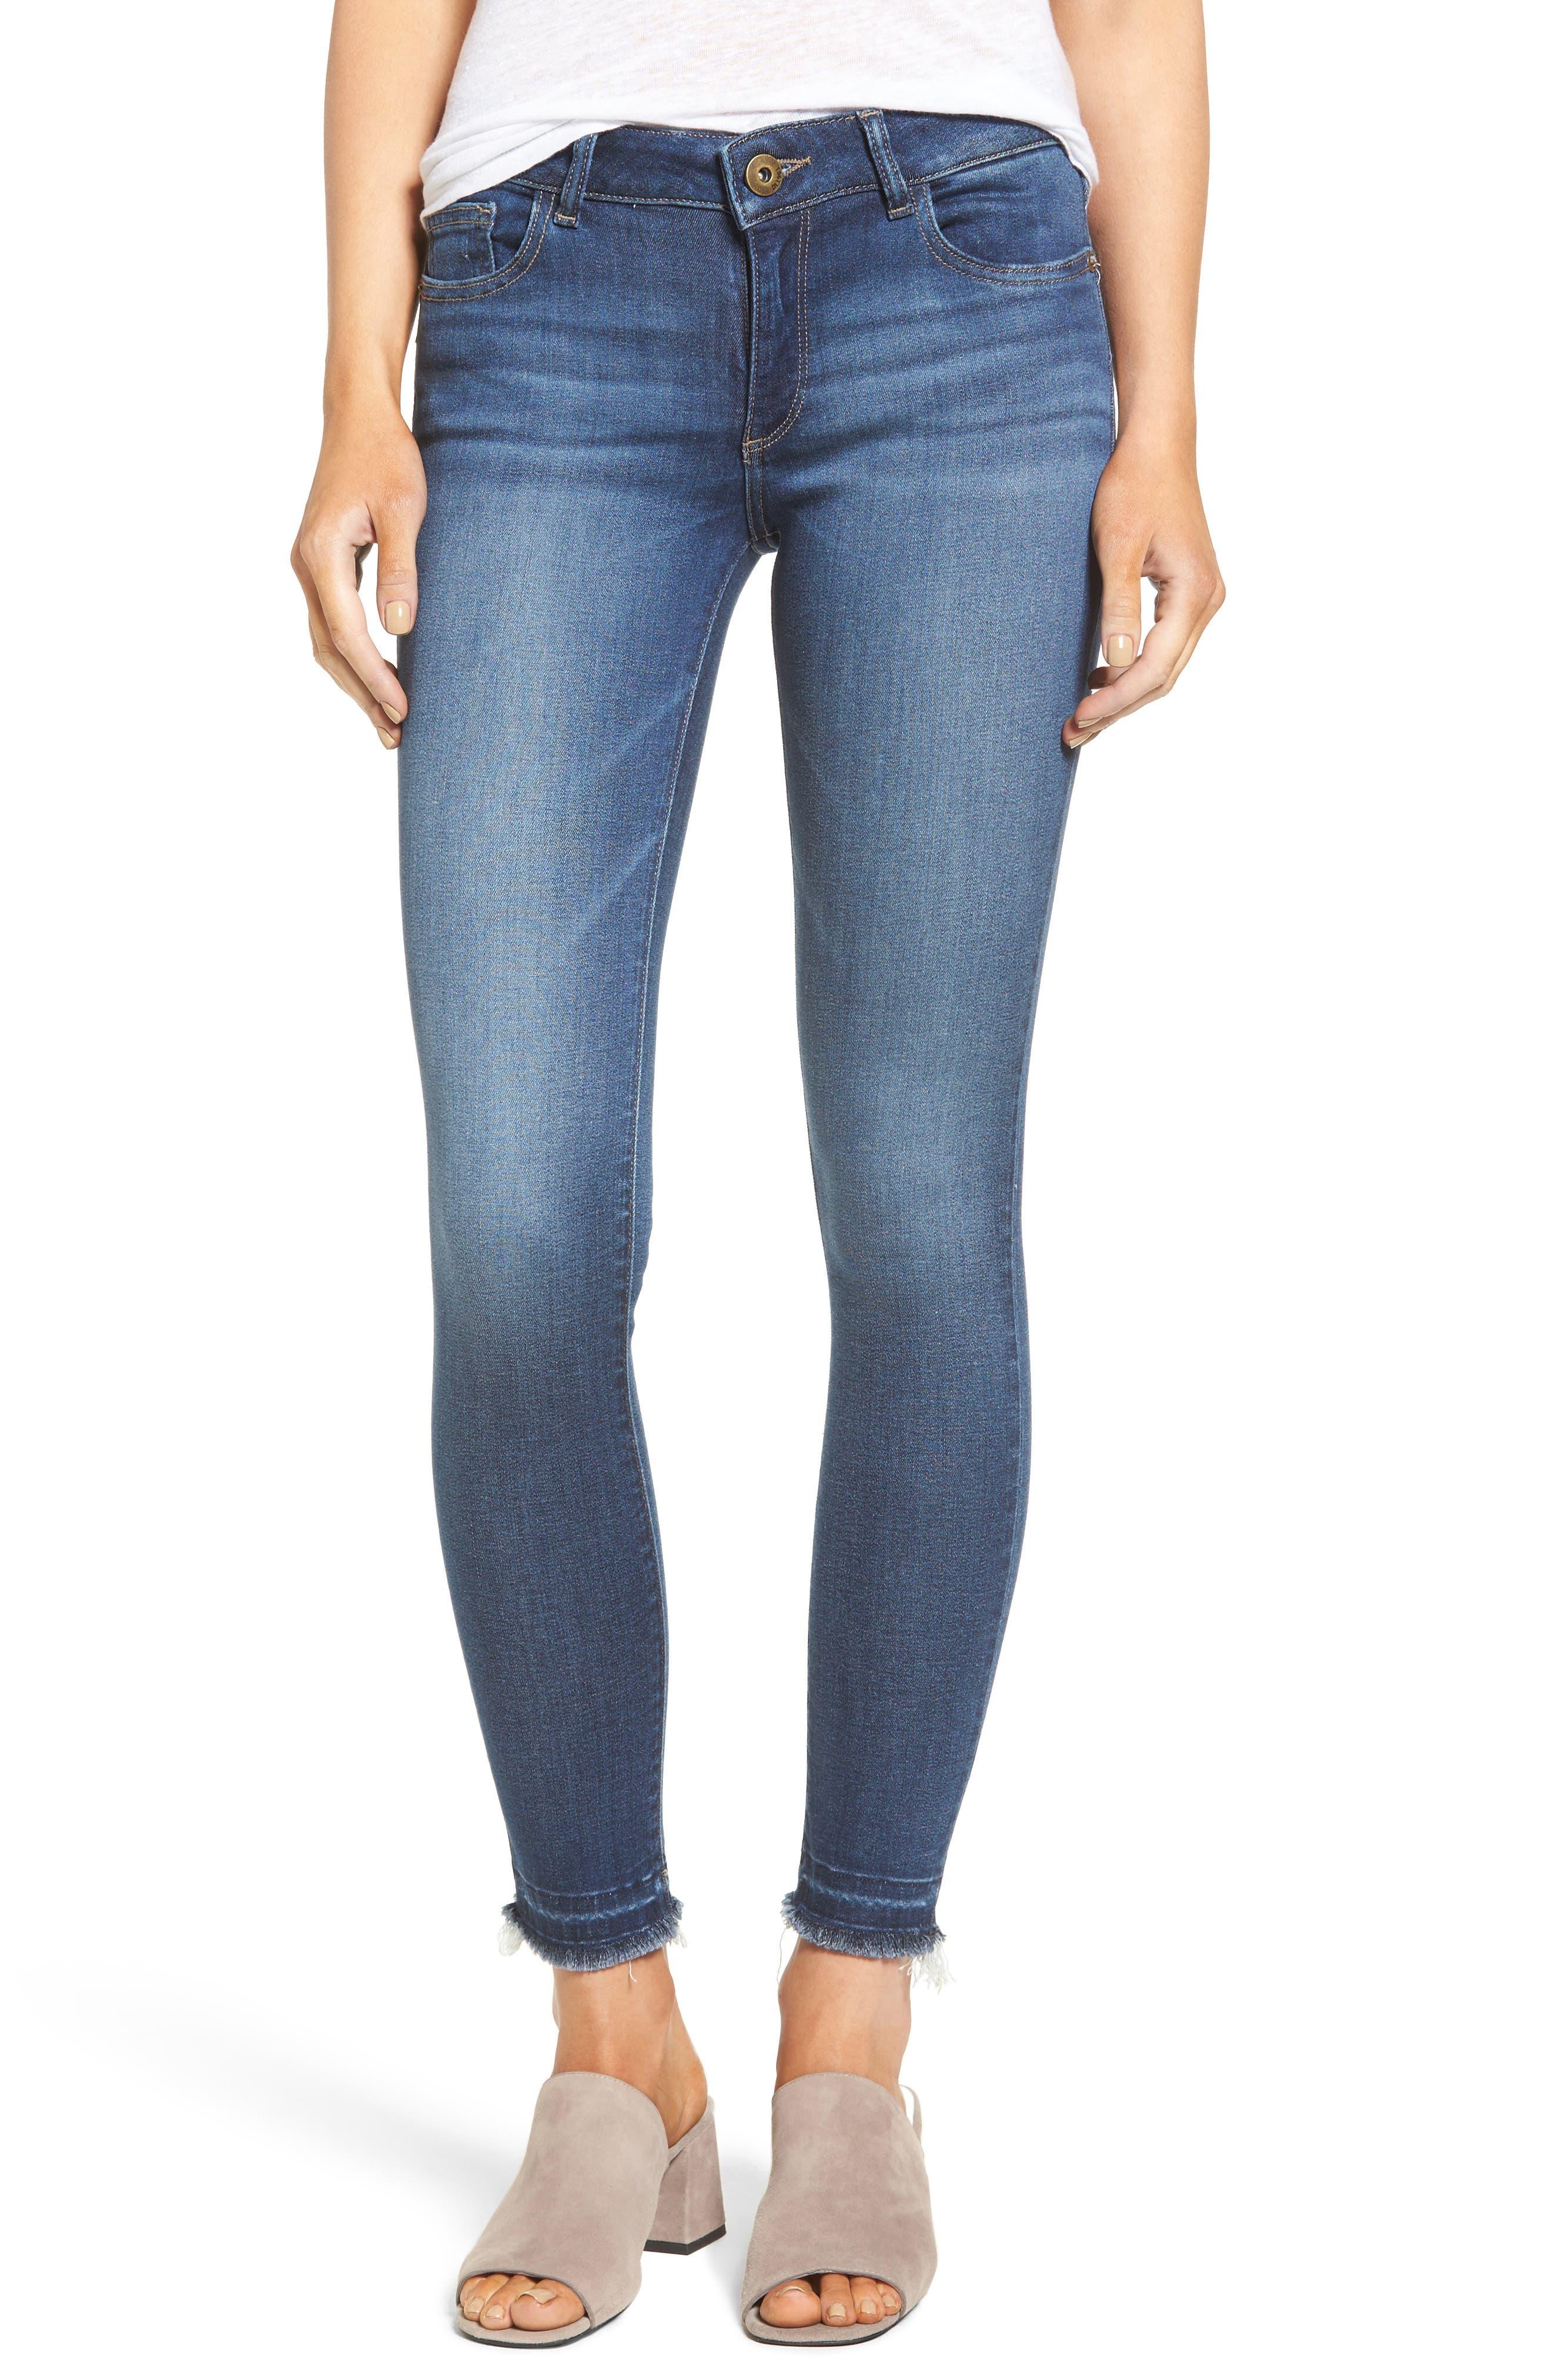 Emma Power Legging Jeans,                             Main thumbnail 1, color,                             405